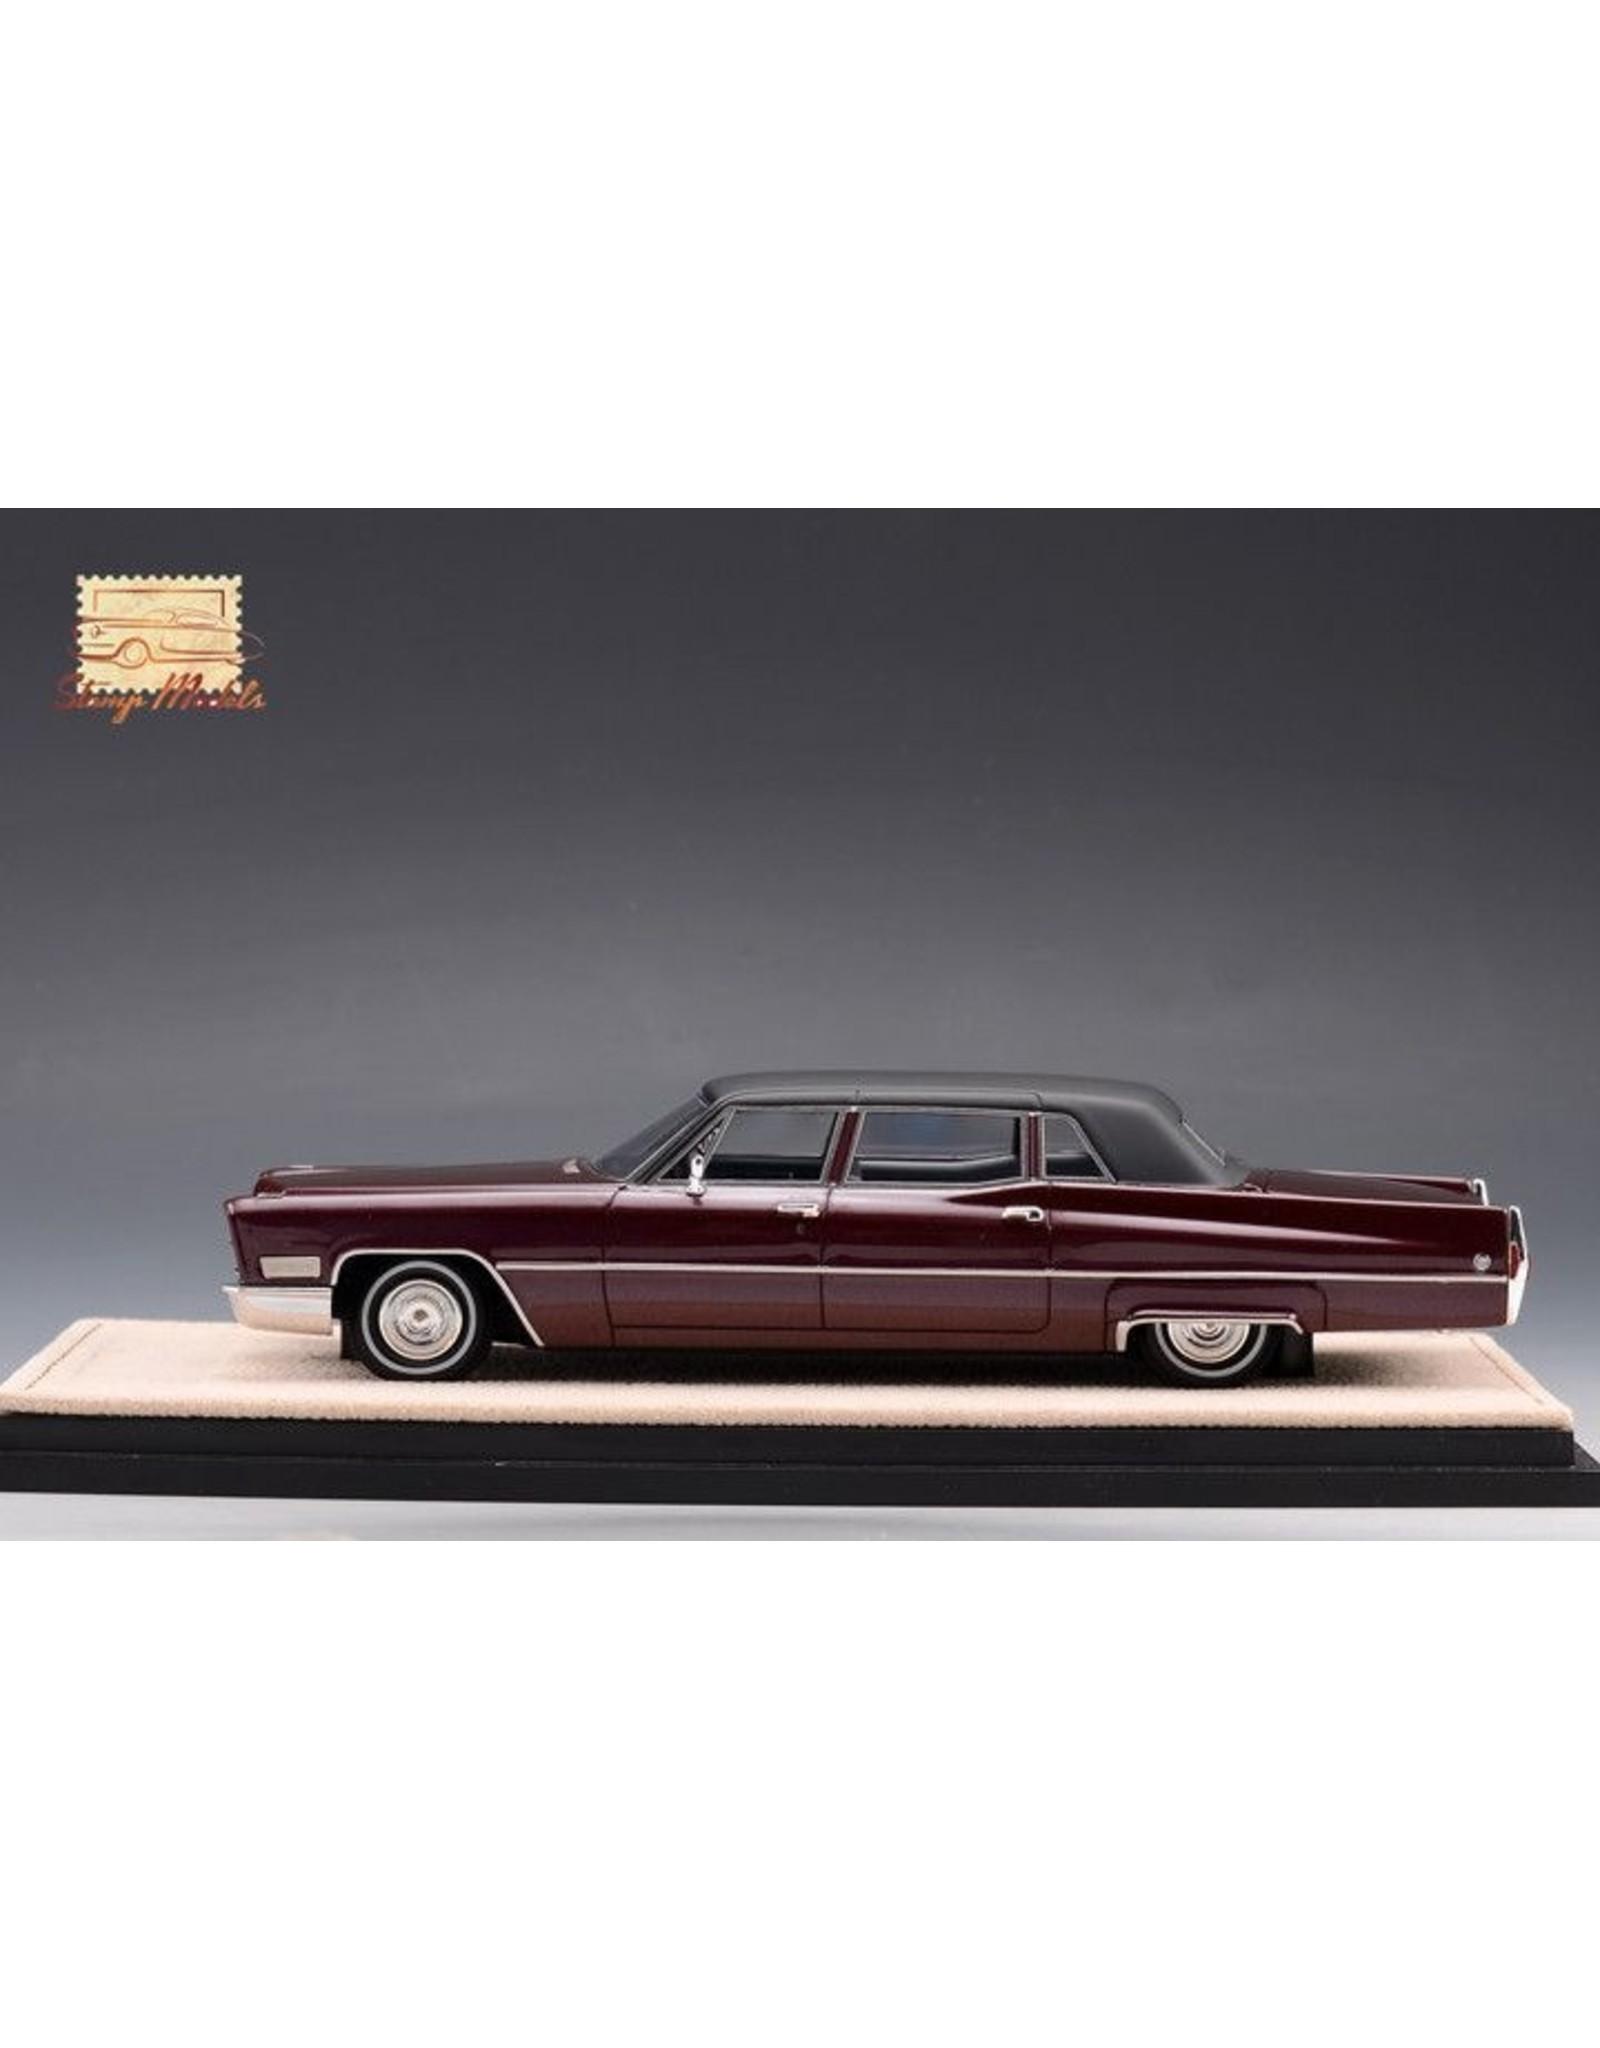 Cadillac(General Motors) Cadillac Fleetwood Series 75 Limousine(1968)Madeira plum metallic.